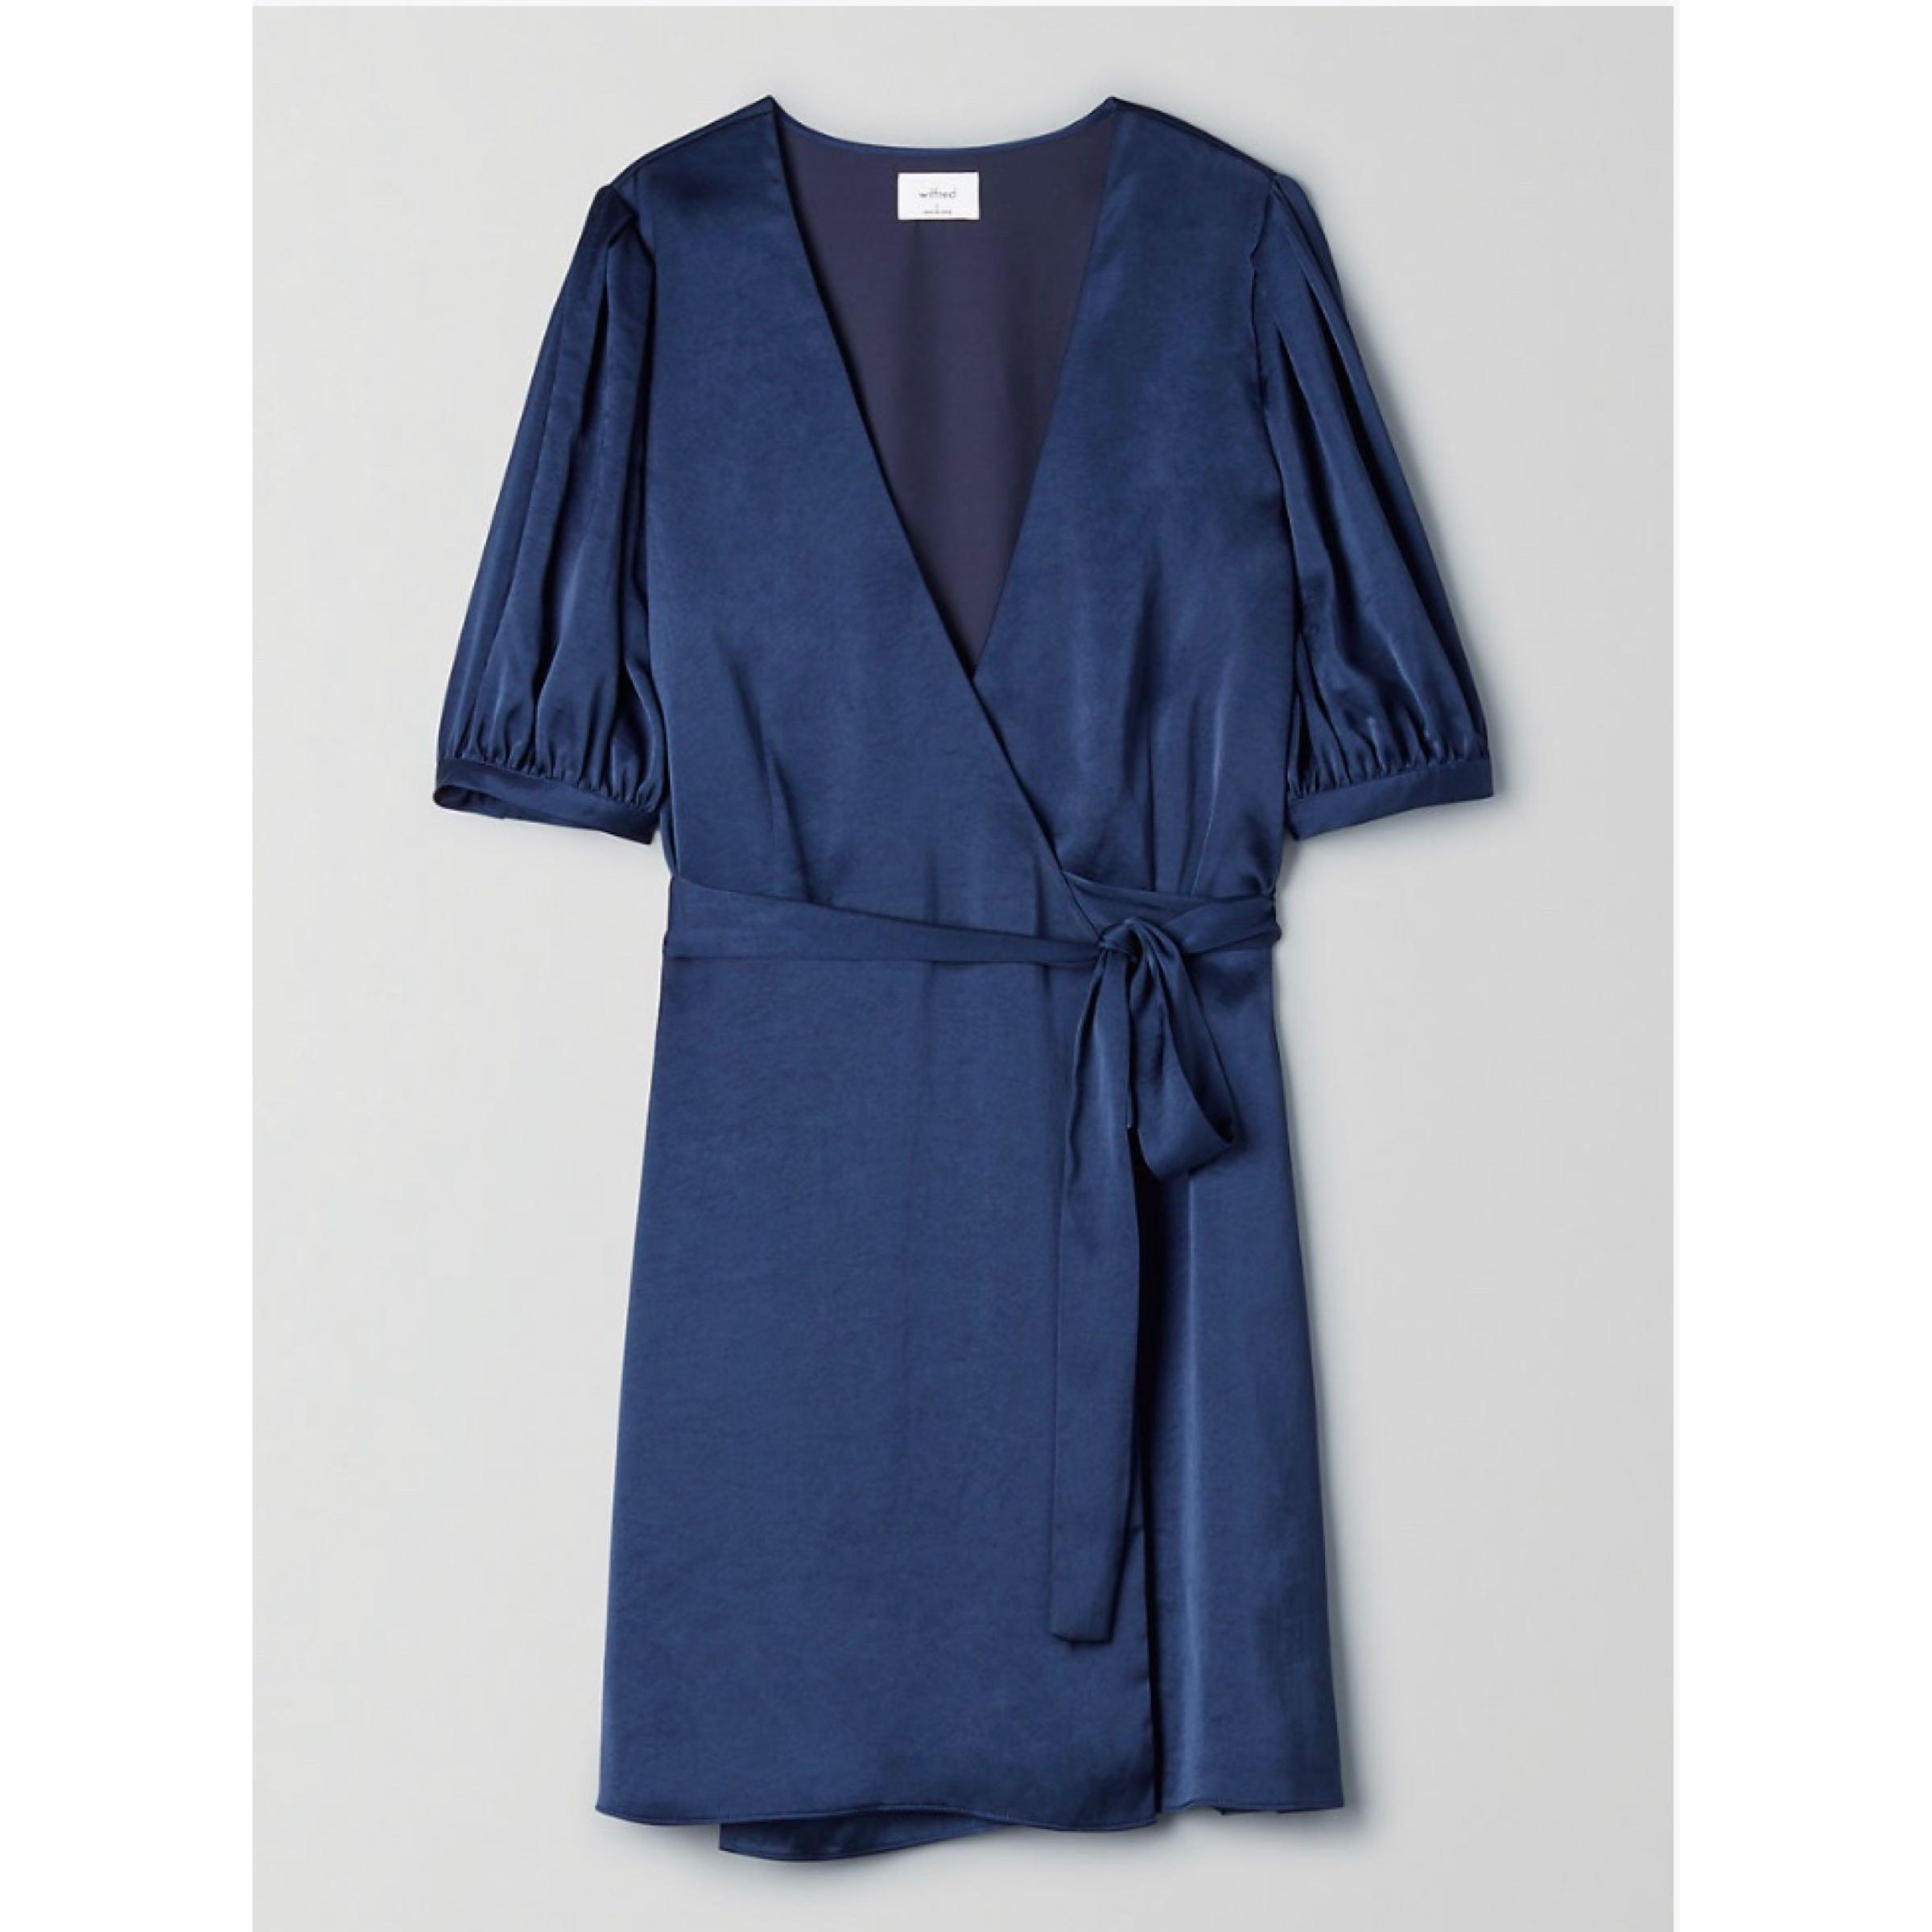 ✨NWT✨ Aritzia Navy blue dress